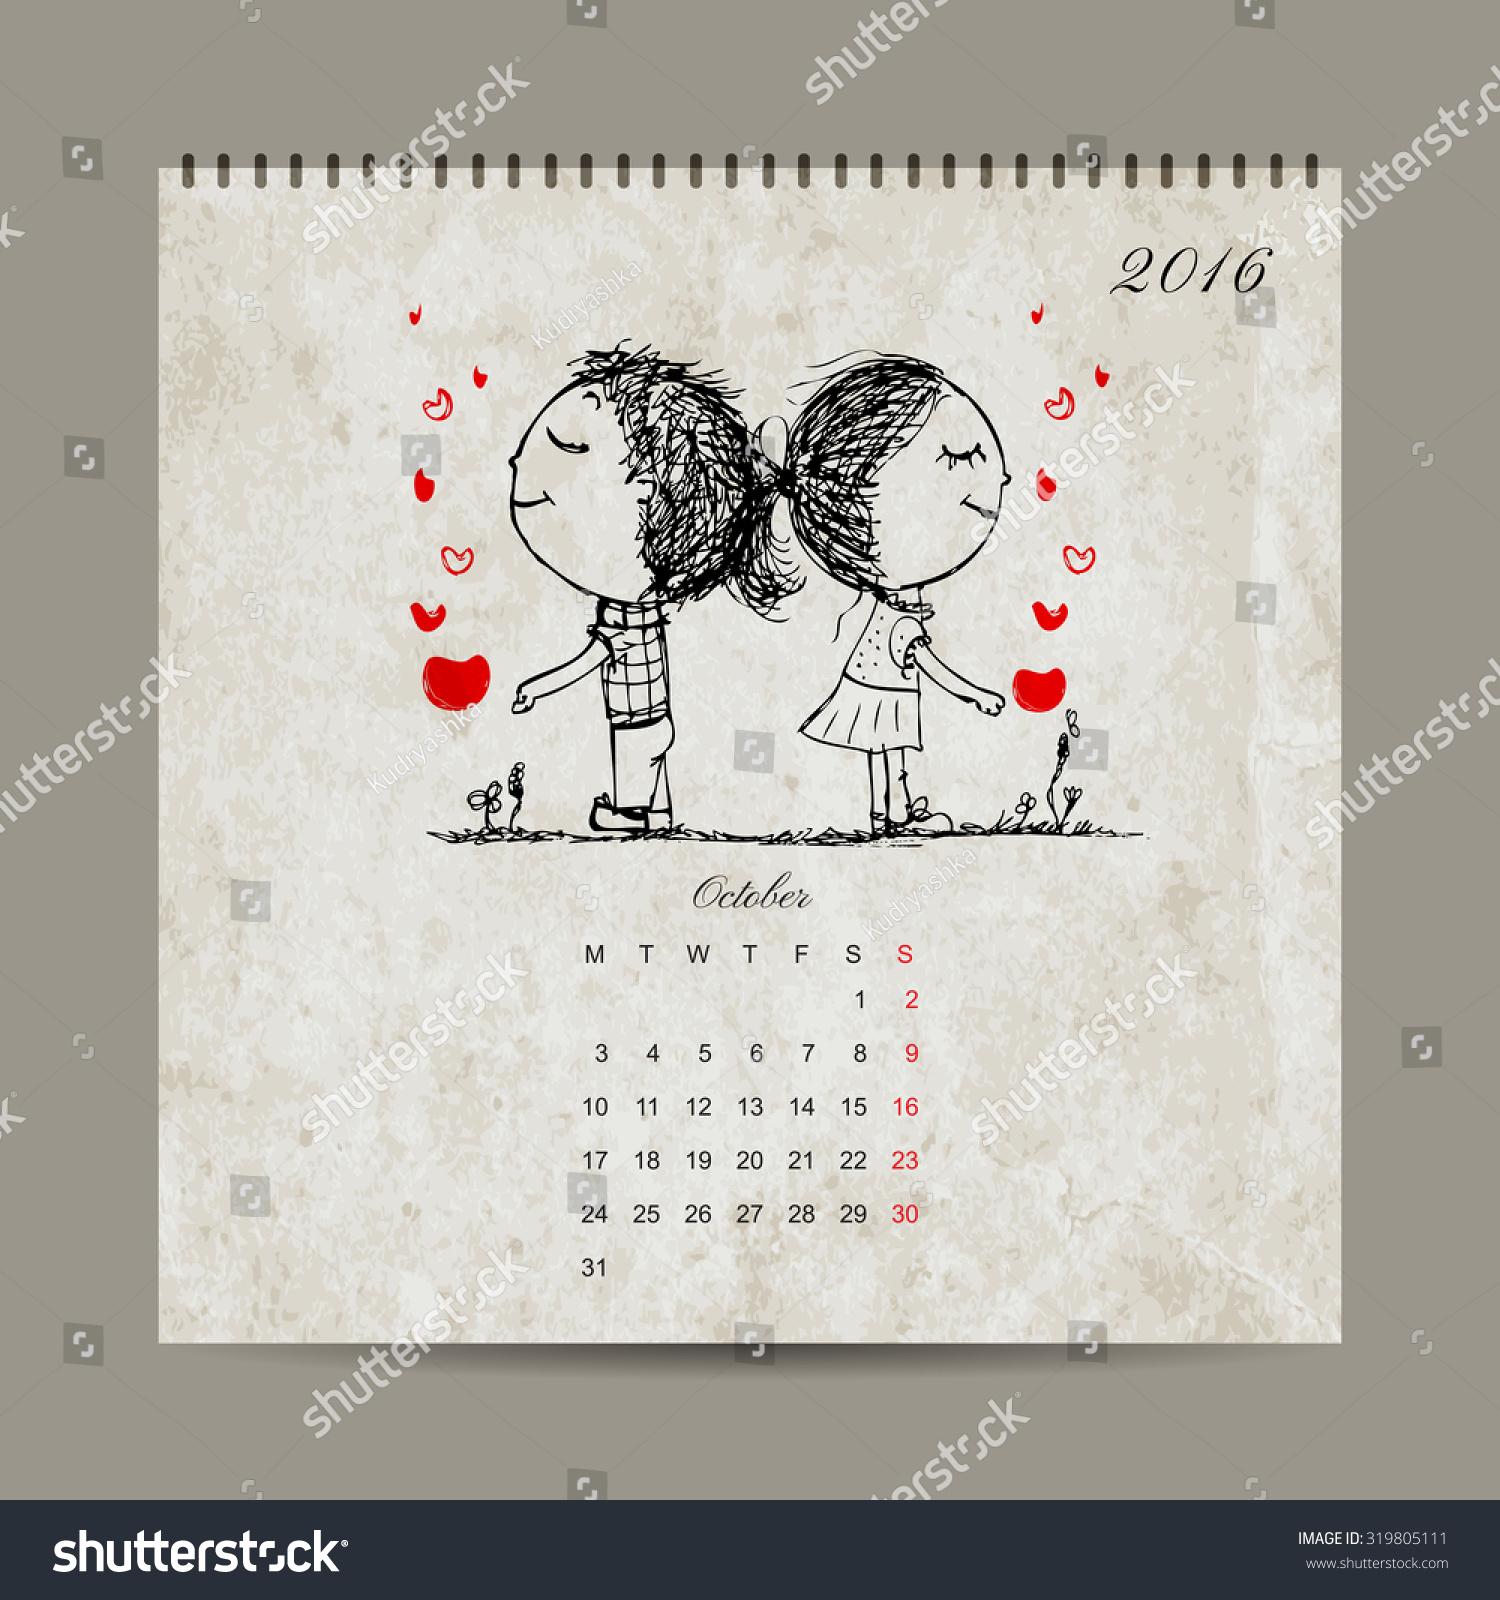 October Calendar Illustration : Calendar grid design october couple in love